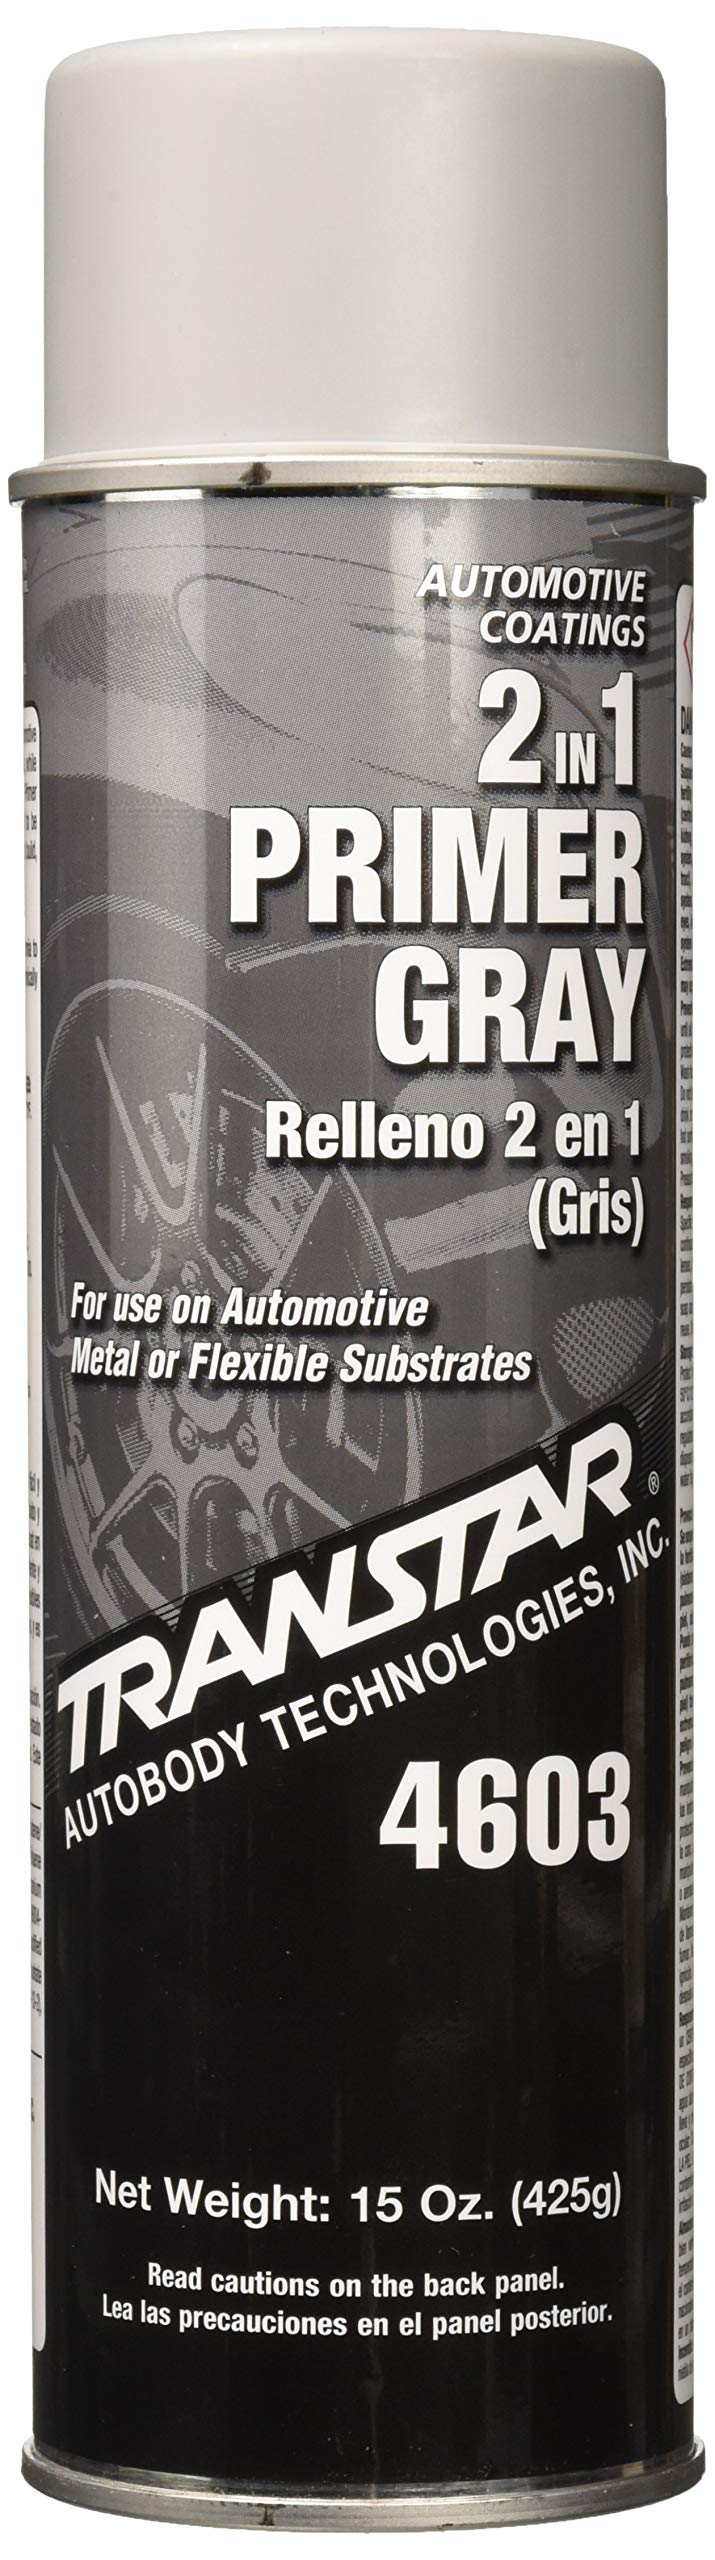 Transtar 4603 Gray 2-in-1 Primer - 15oz by TRANSTAR (Image #4)